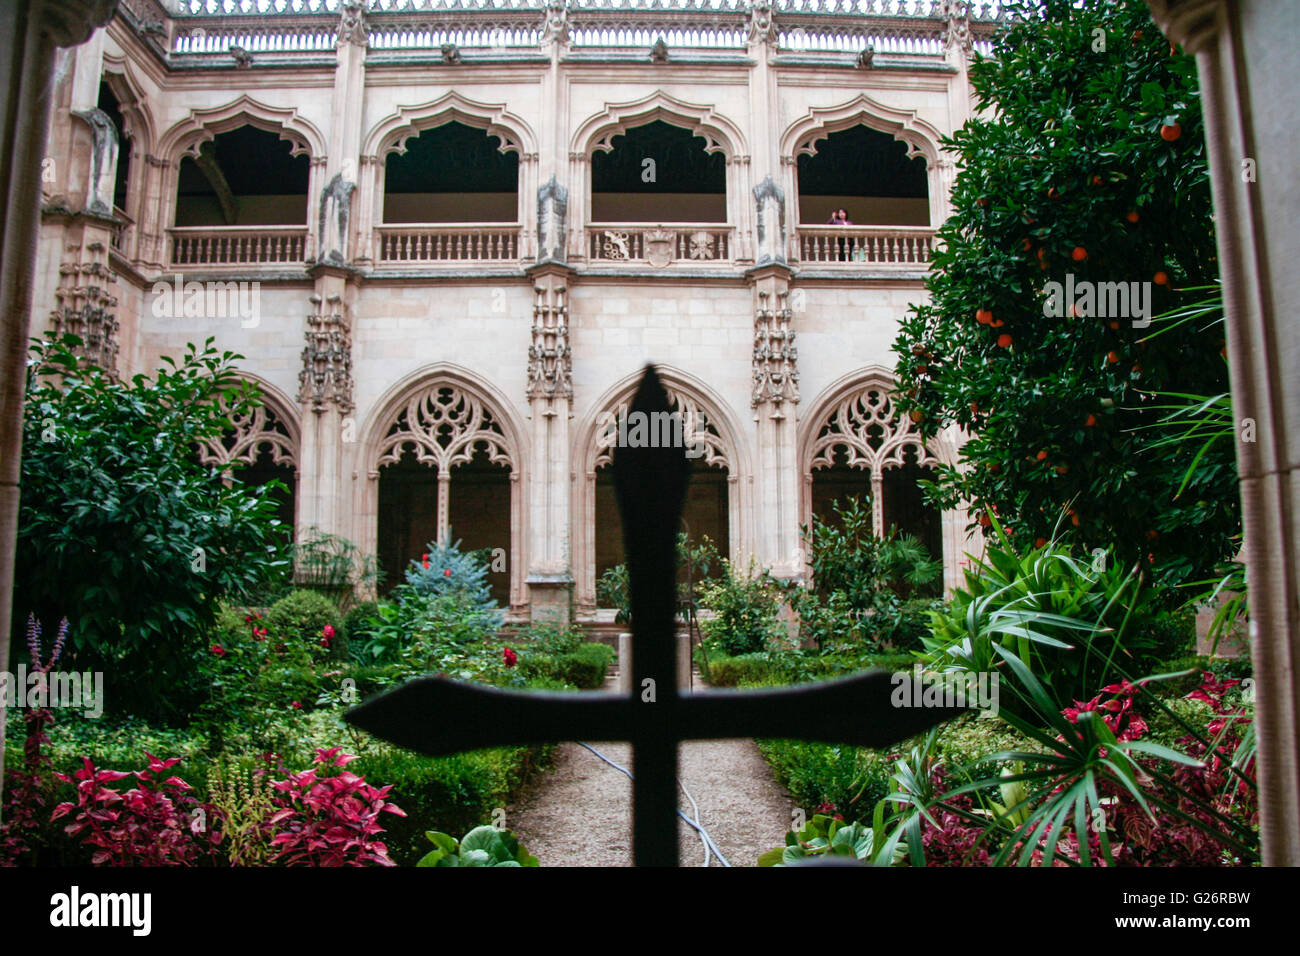 Toledo, Spain -   September 30, 2007: Gothic atrium of Monastery San Juan de los Reyes  Cross - Stock Image